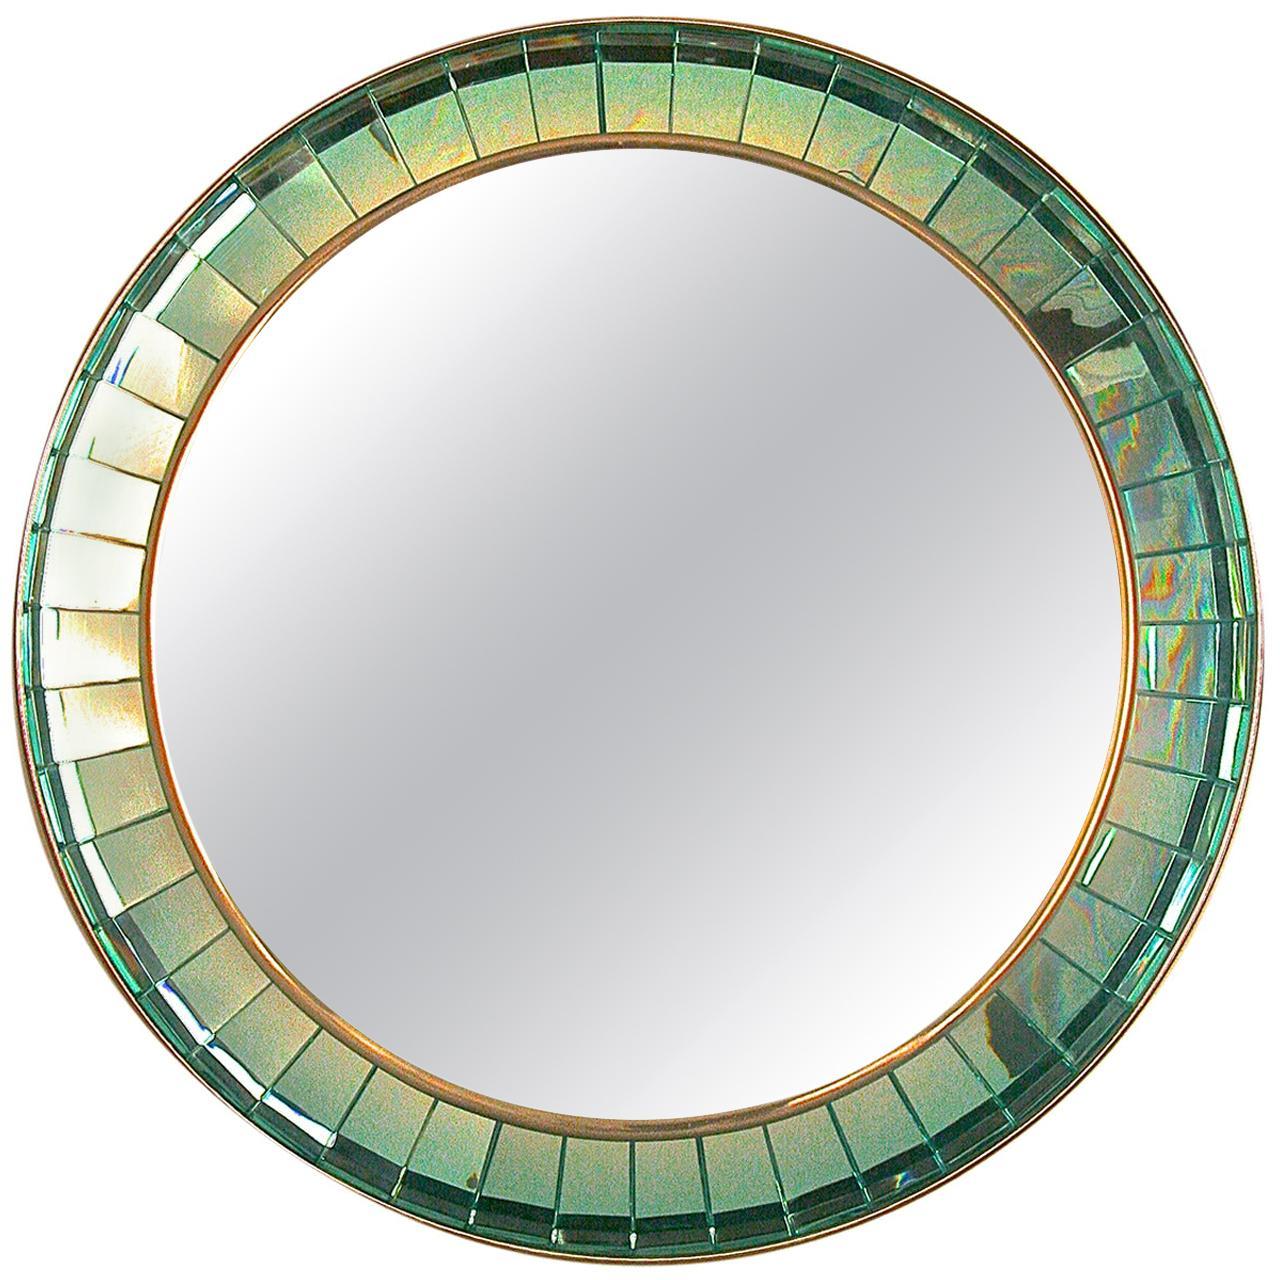 Handcut Crystal Glass Mirror by Ghiro Studios, Italy